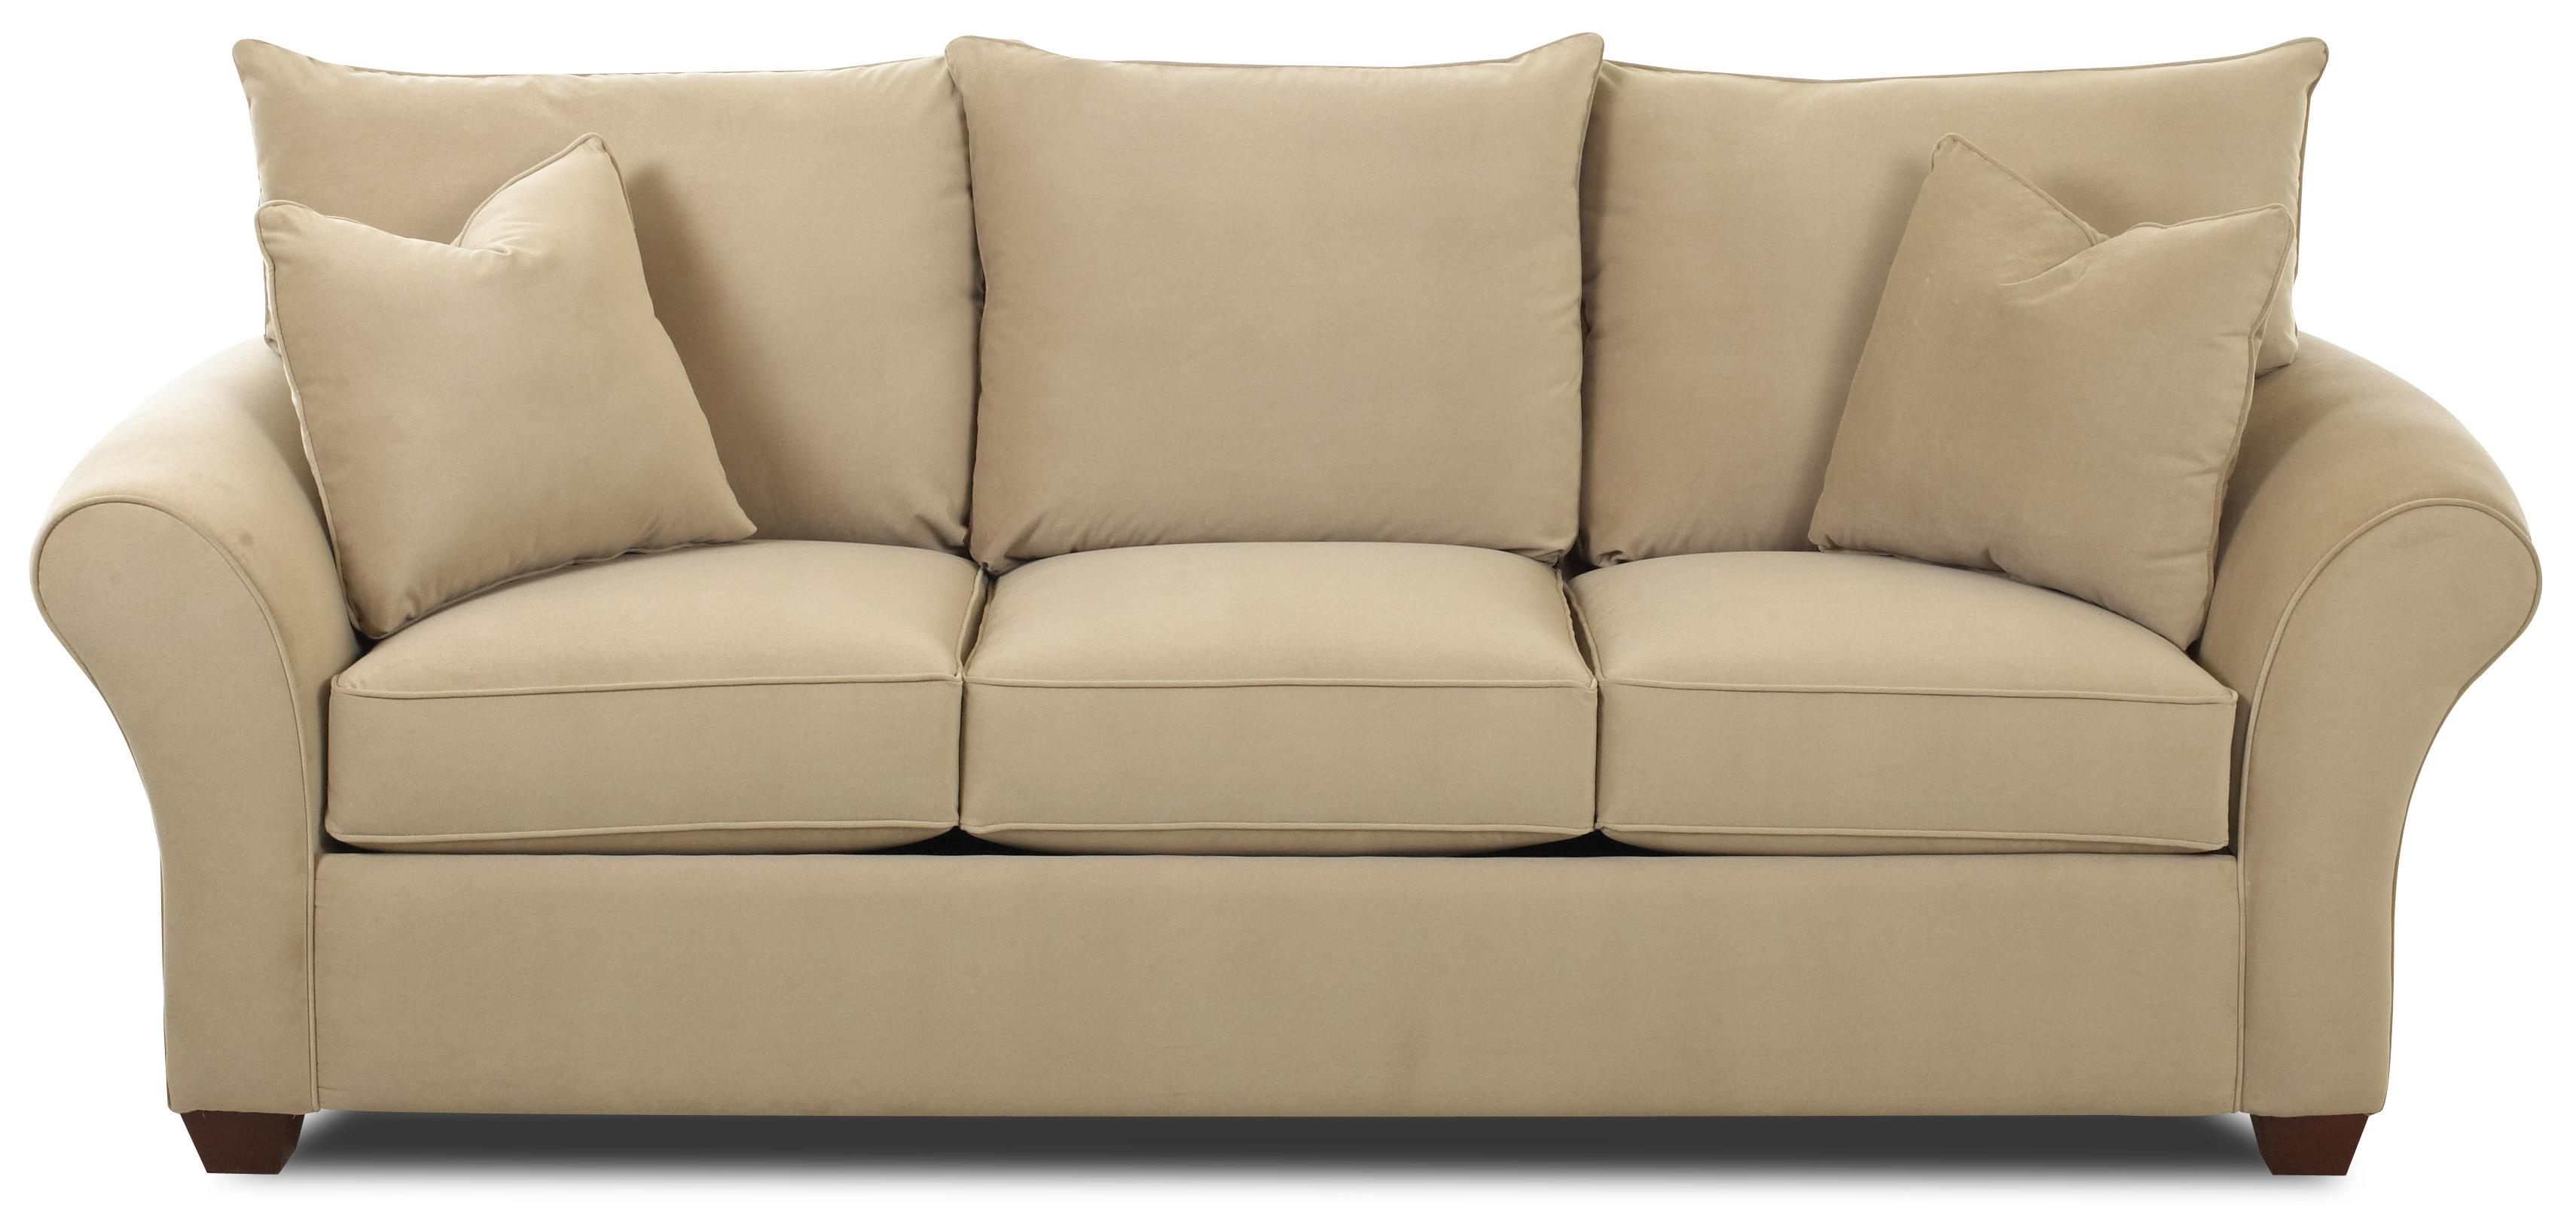 most comfortable sofa bed savannah rattan garden furniture corner set the couch homesfeed